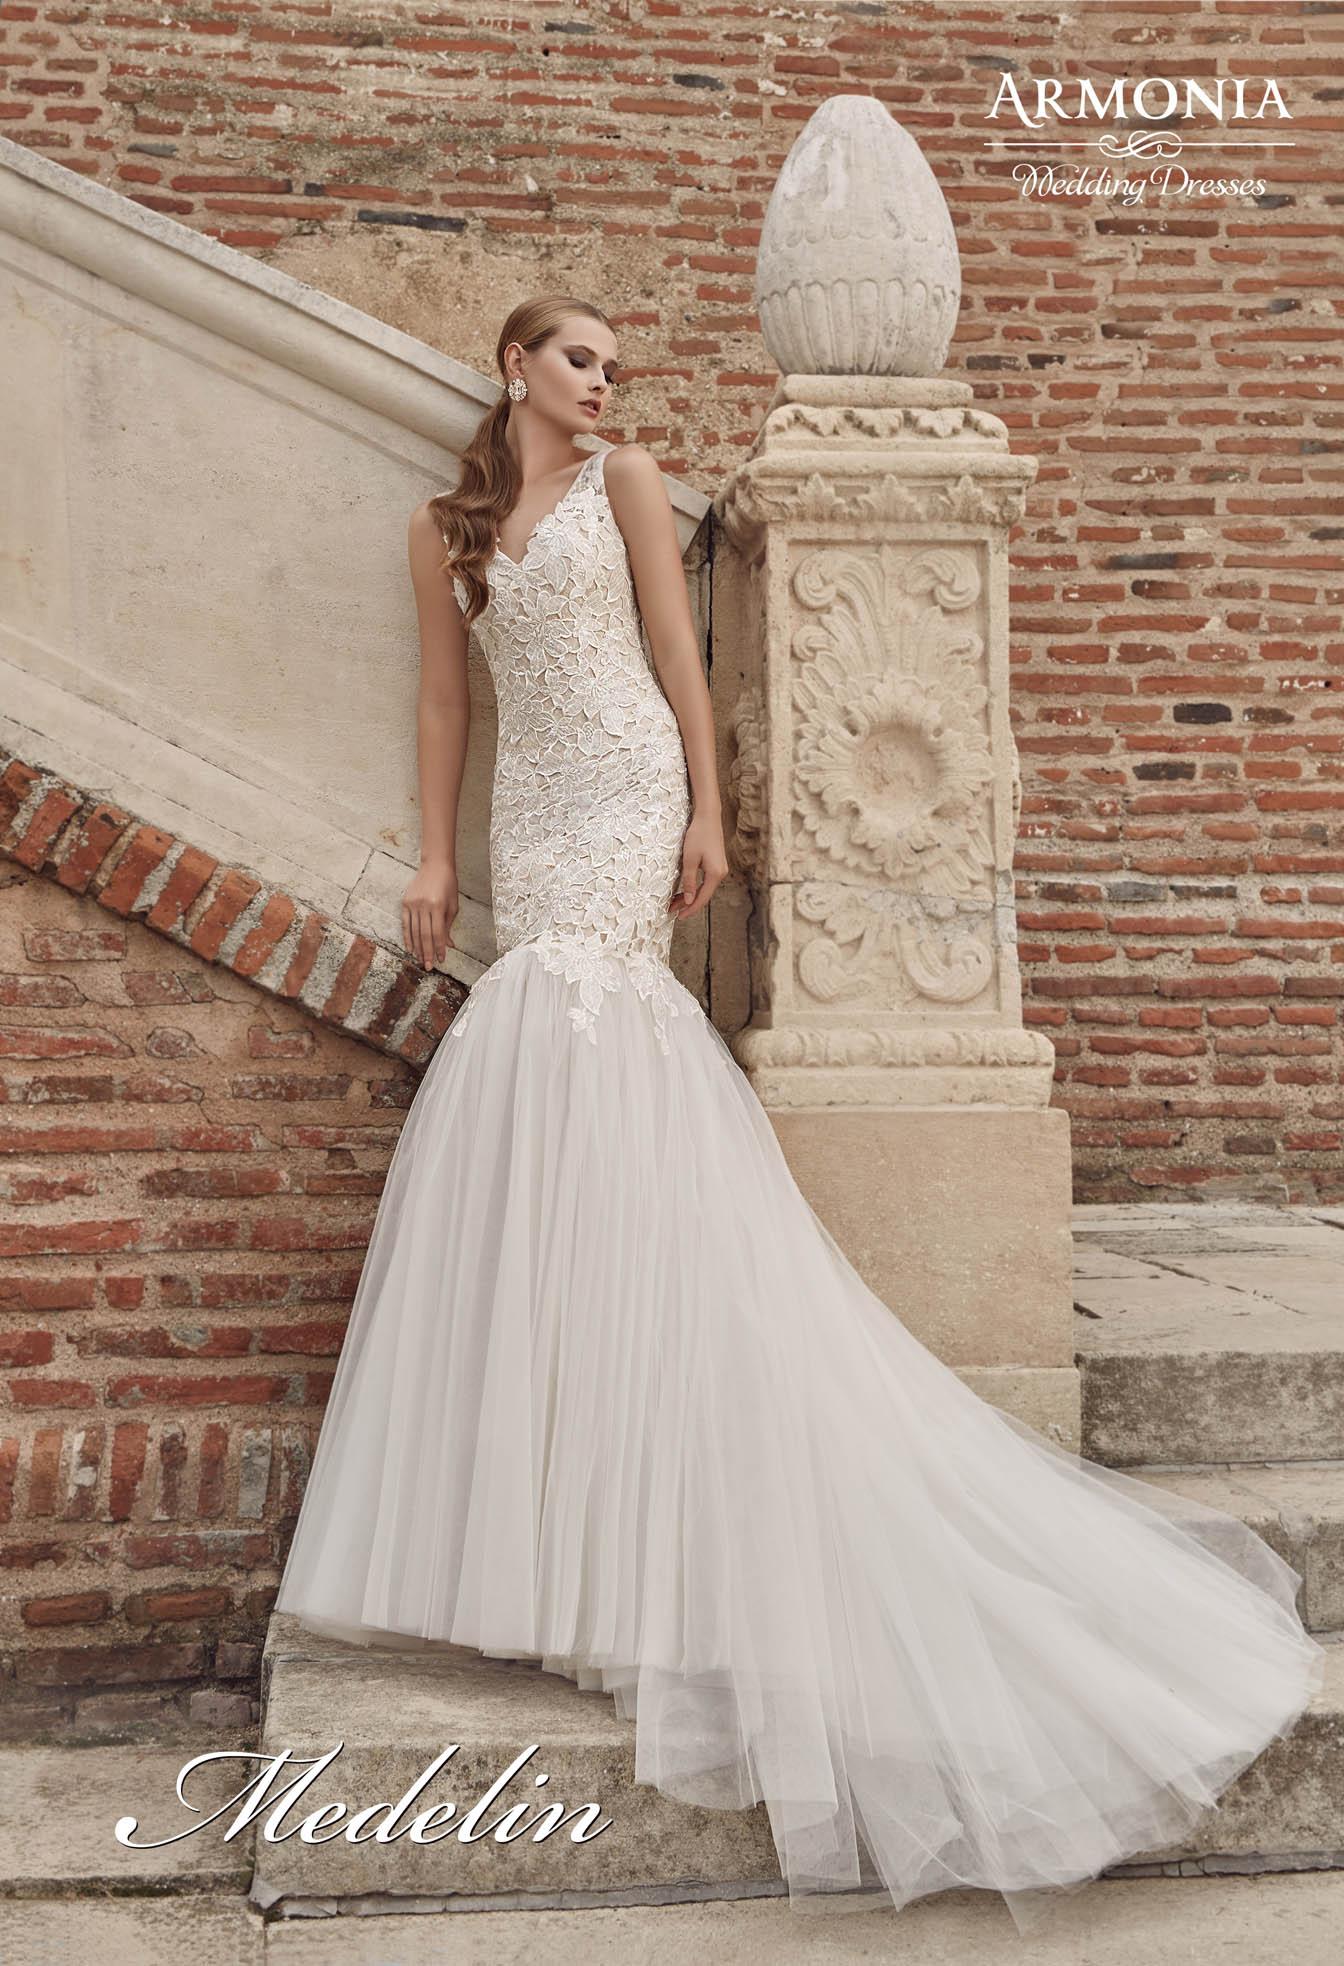 Свадебное платье Medelin Armonia